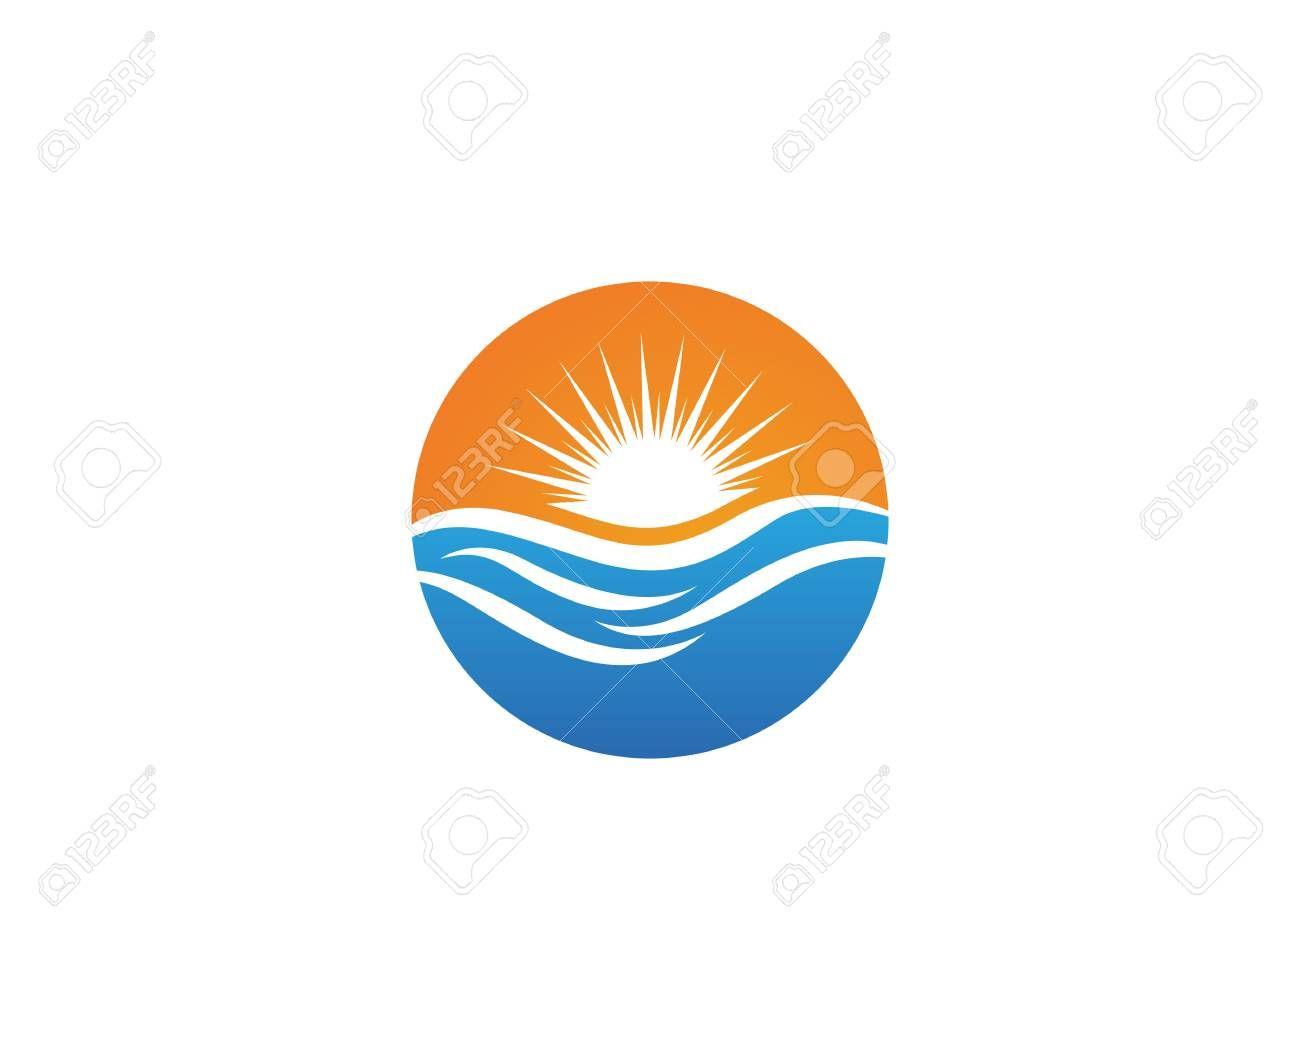 Sun Vector Illustration Icon Template Design Vector Illustration Ad Illustration Vector Sun Icon Illust In 2020 Graphic Design Art Tech Logos Design Art